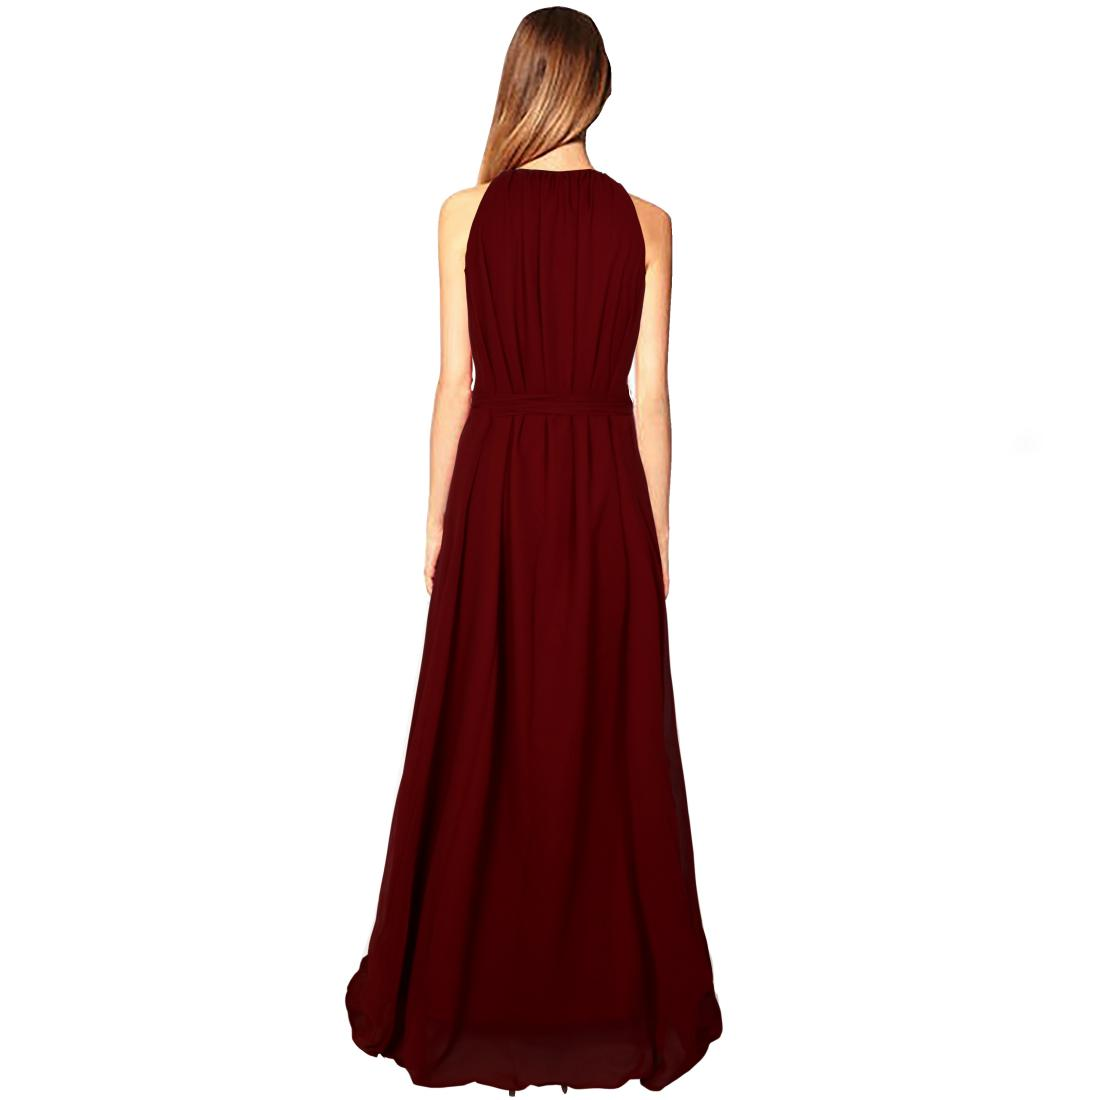 bdda45ea2 Viha Georgette Maroon Fit And Flare Long Dress